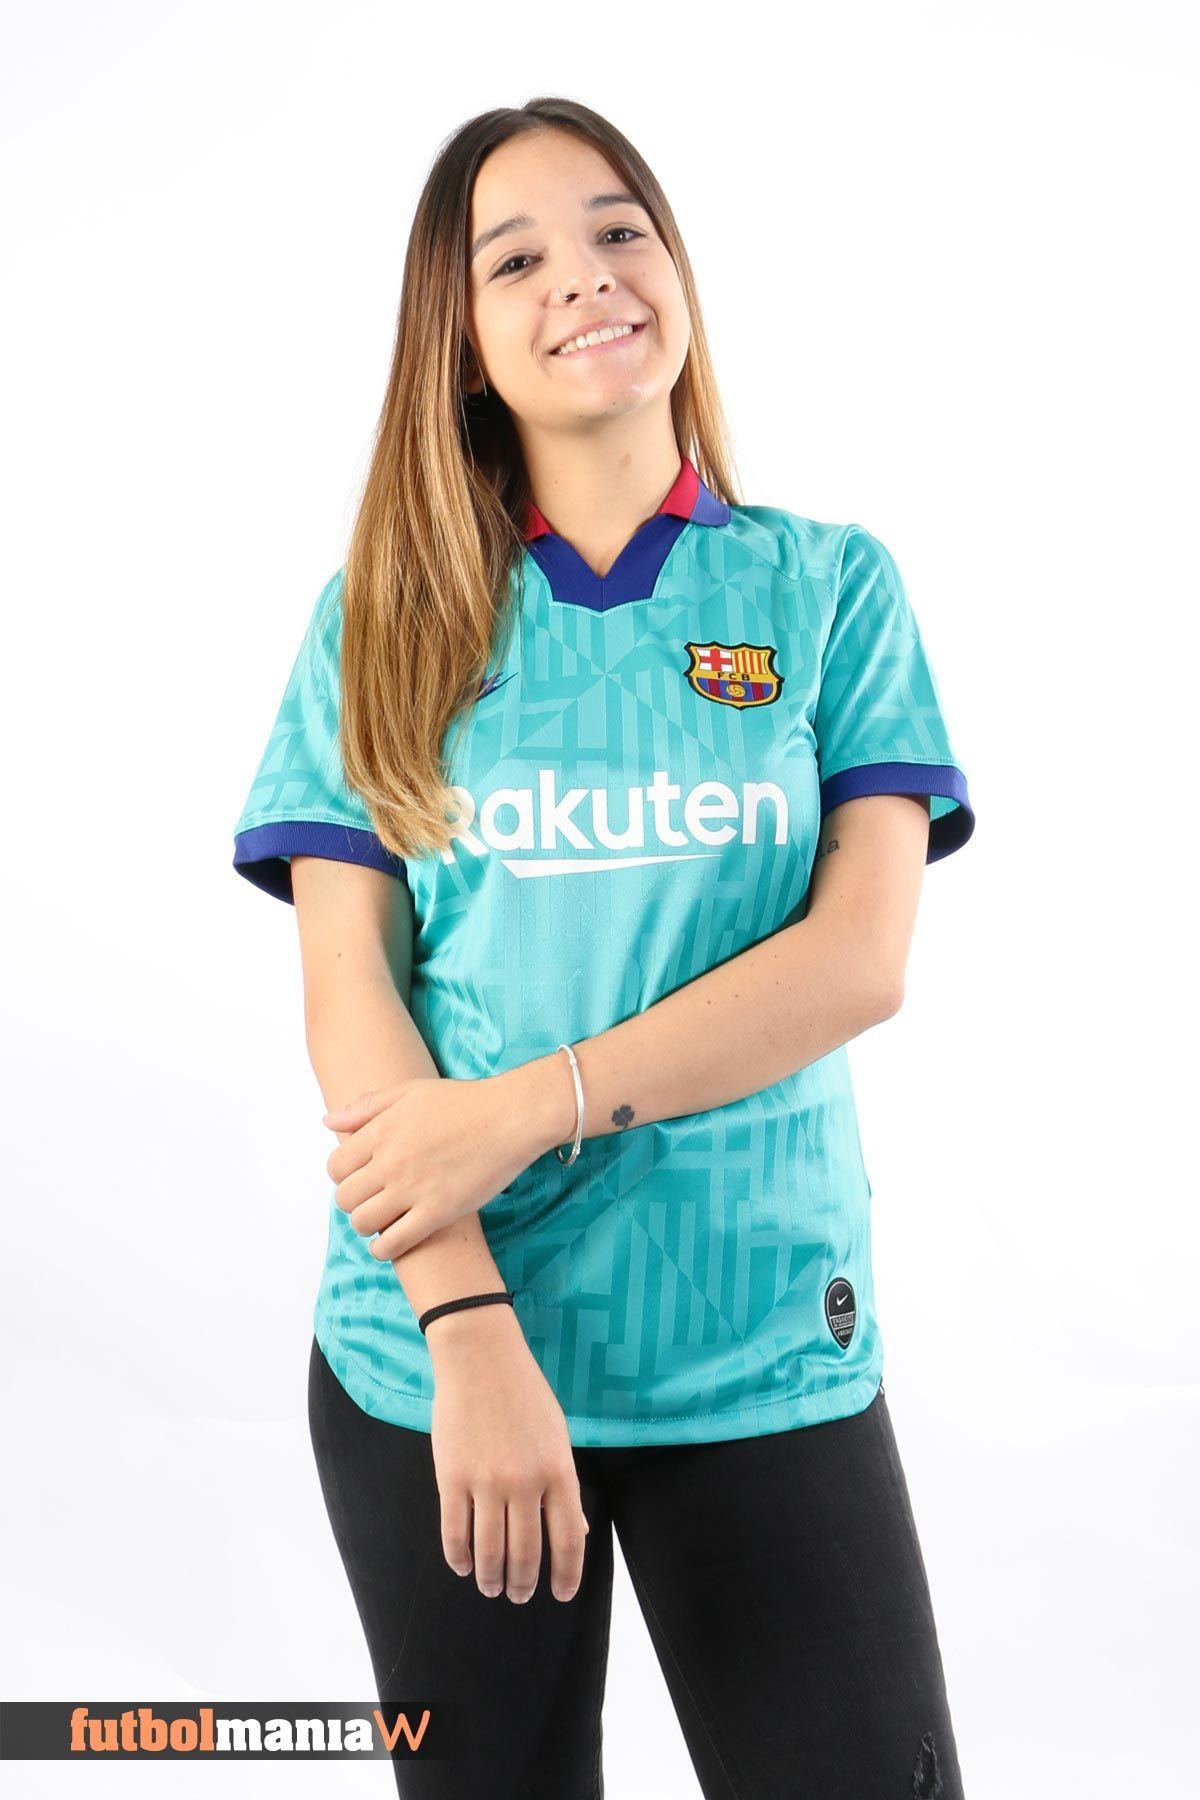 Sin personal Solitario Derribar  Camiseta Nike 3a Barcelona mujer 19 2020 Stadium | Futbol femenino, Fútbol  de barcelona, Nike fútbol